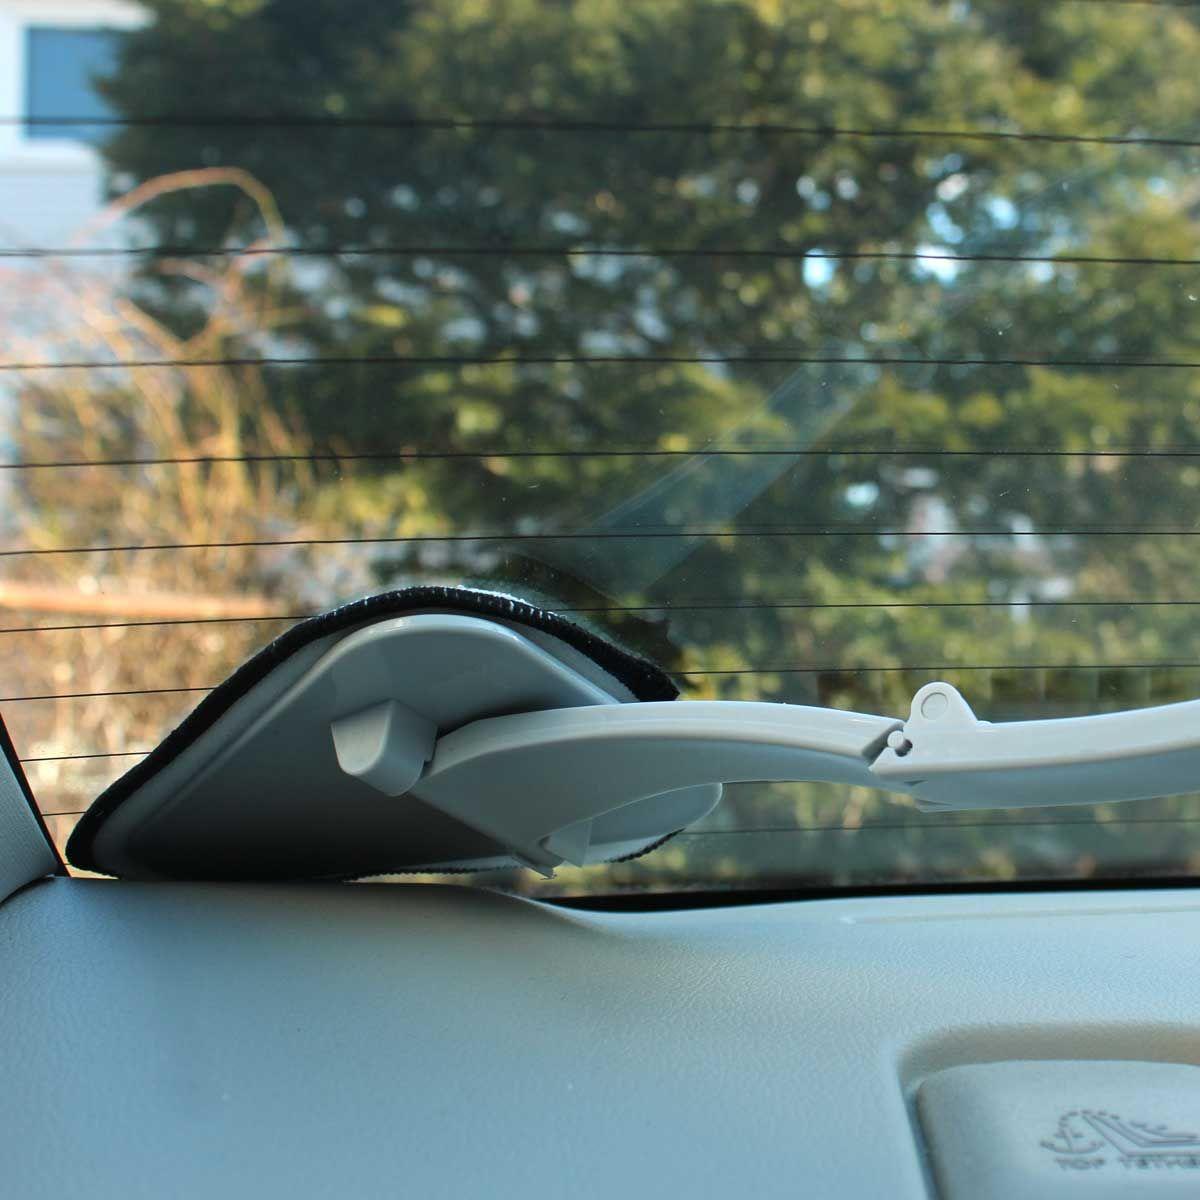 How To Clean Inside Car Windows Inside Car Car Window Clean Car Windows Inside